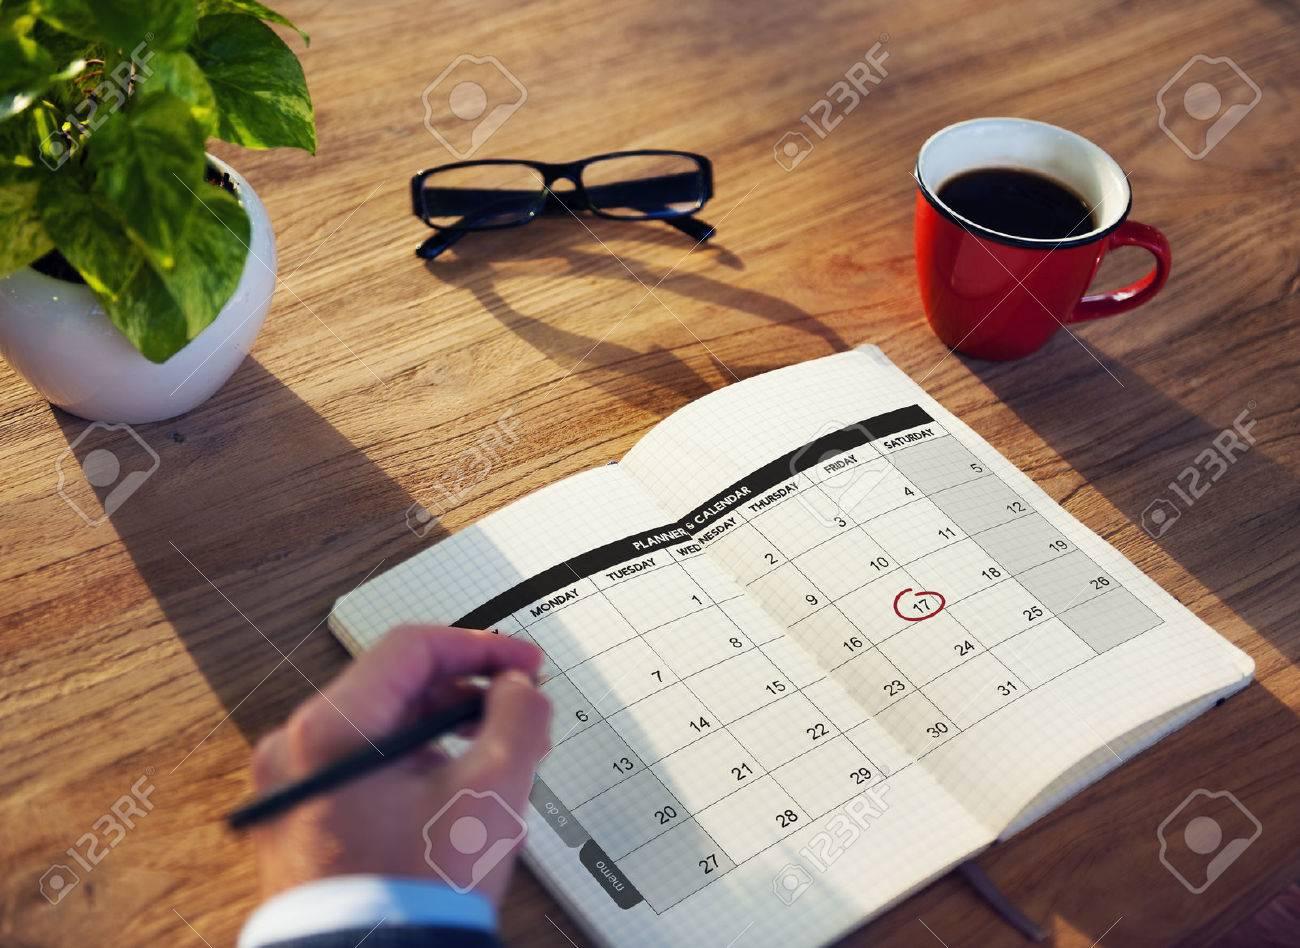 Calender Planner Organization Management Remind Concept - 52448586